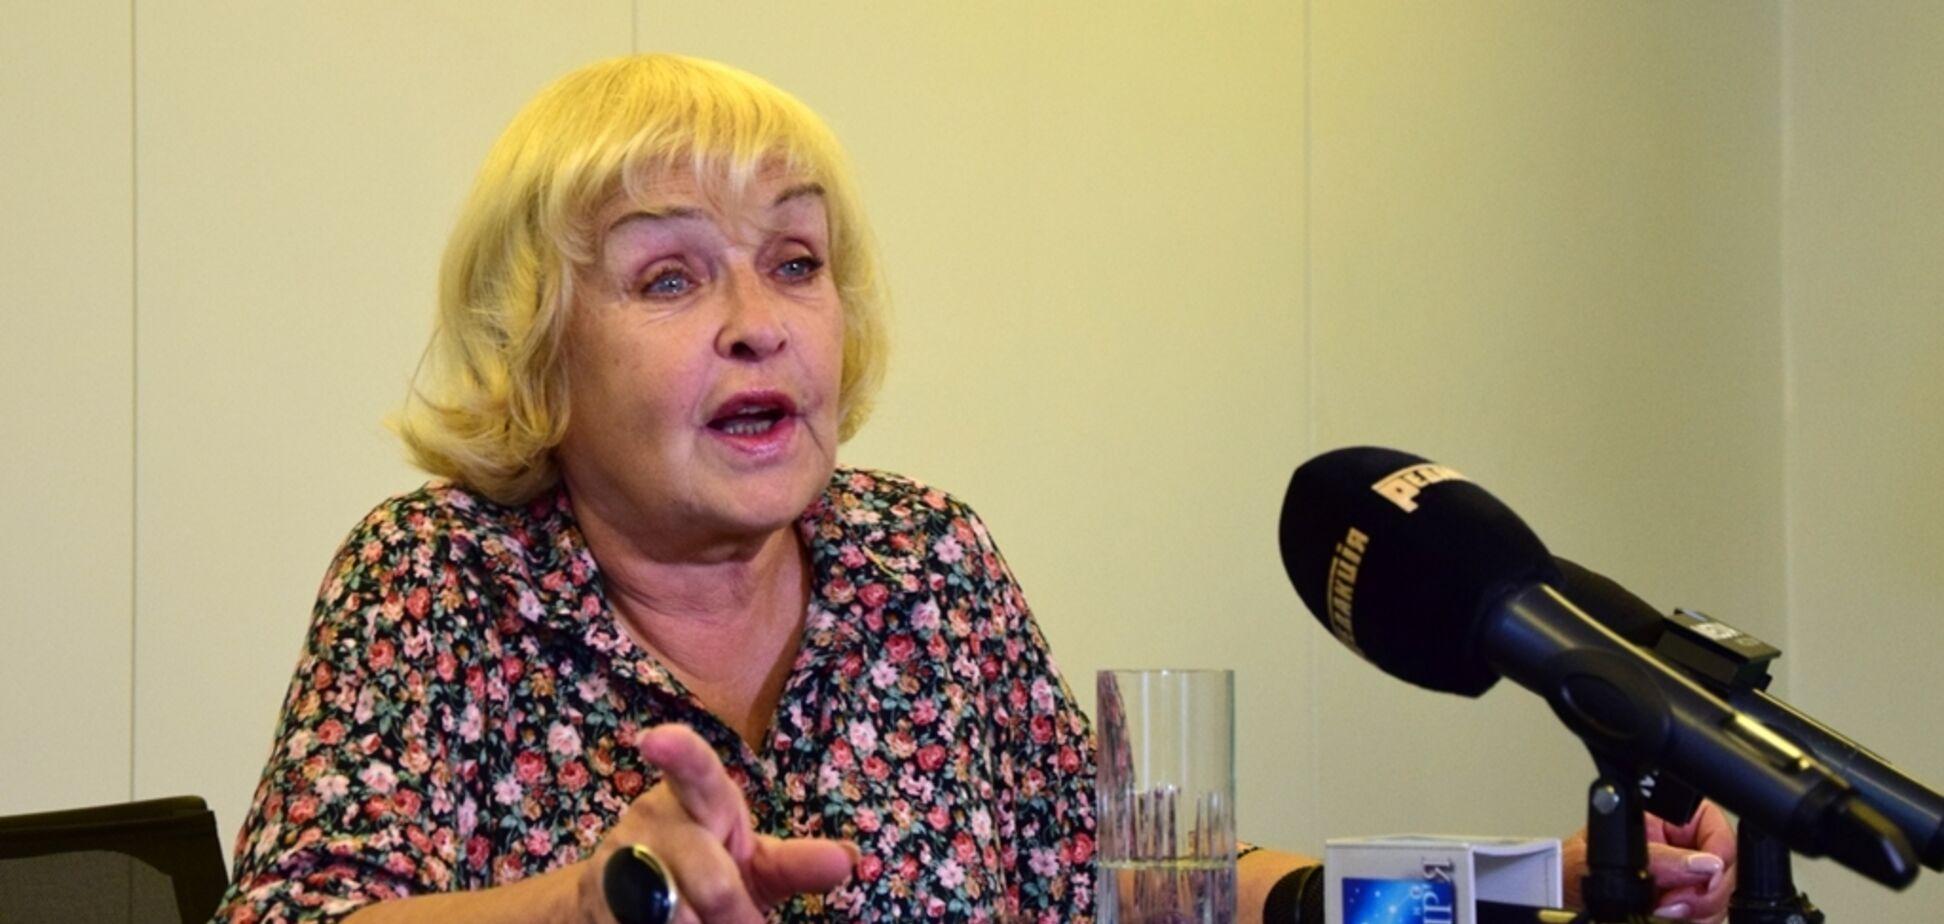 Заливают суп через нос: Роговцева рассказала о мучениях Сенцова